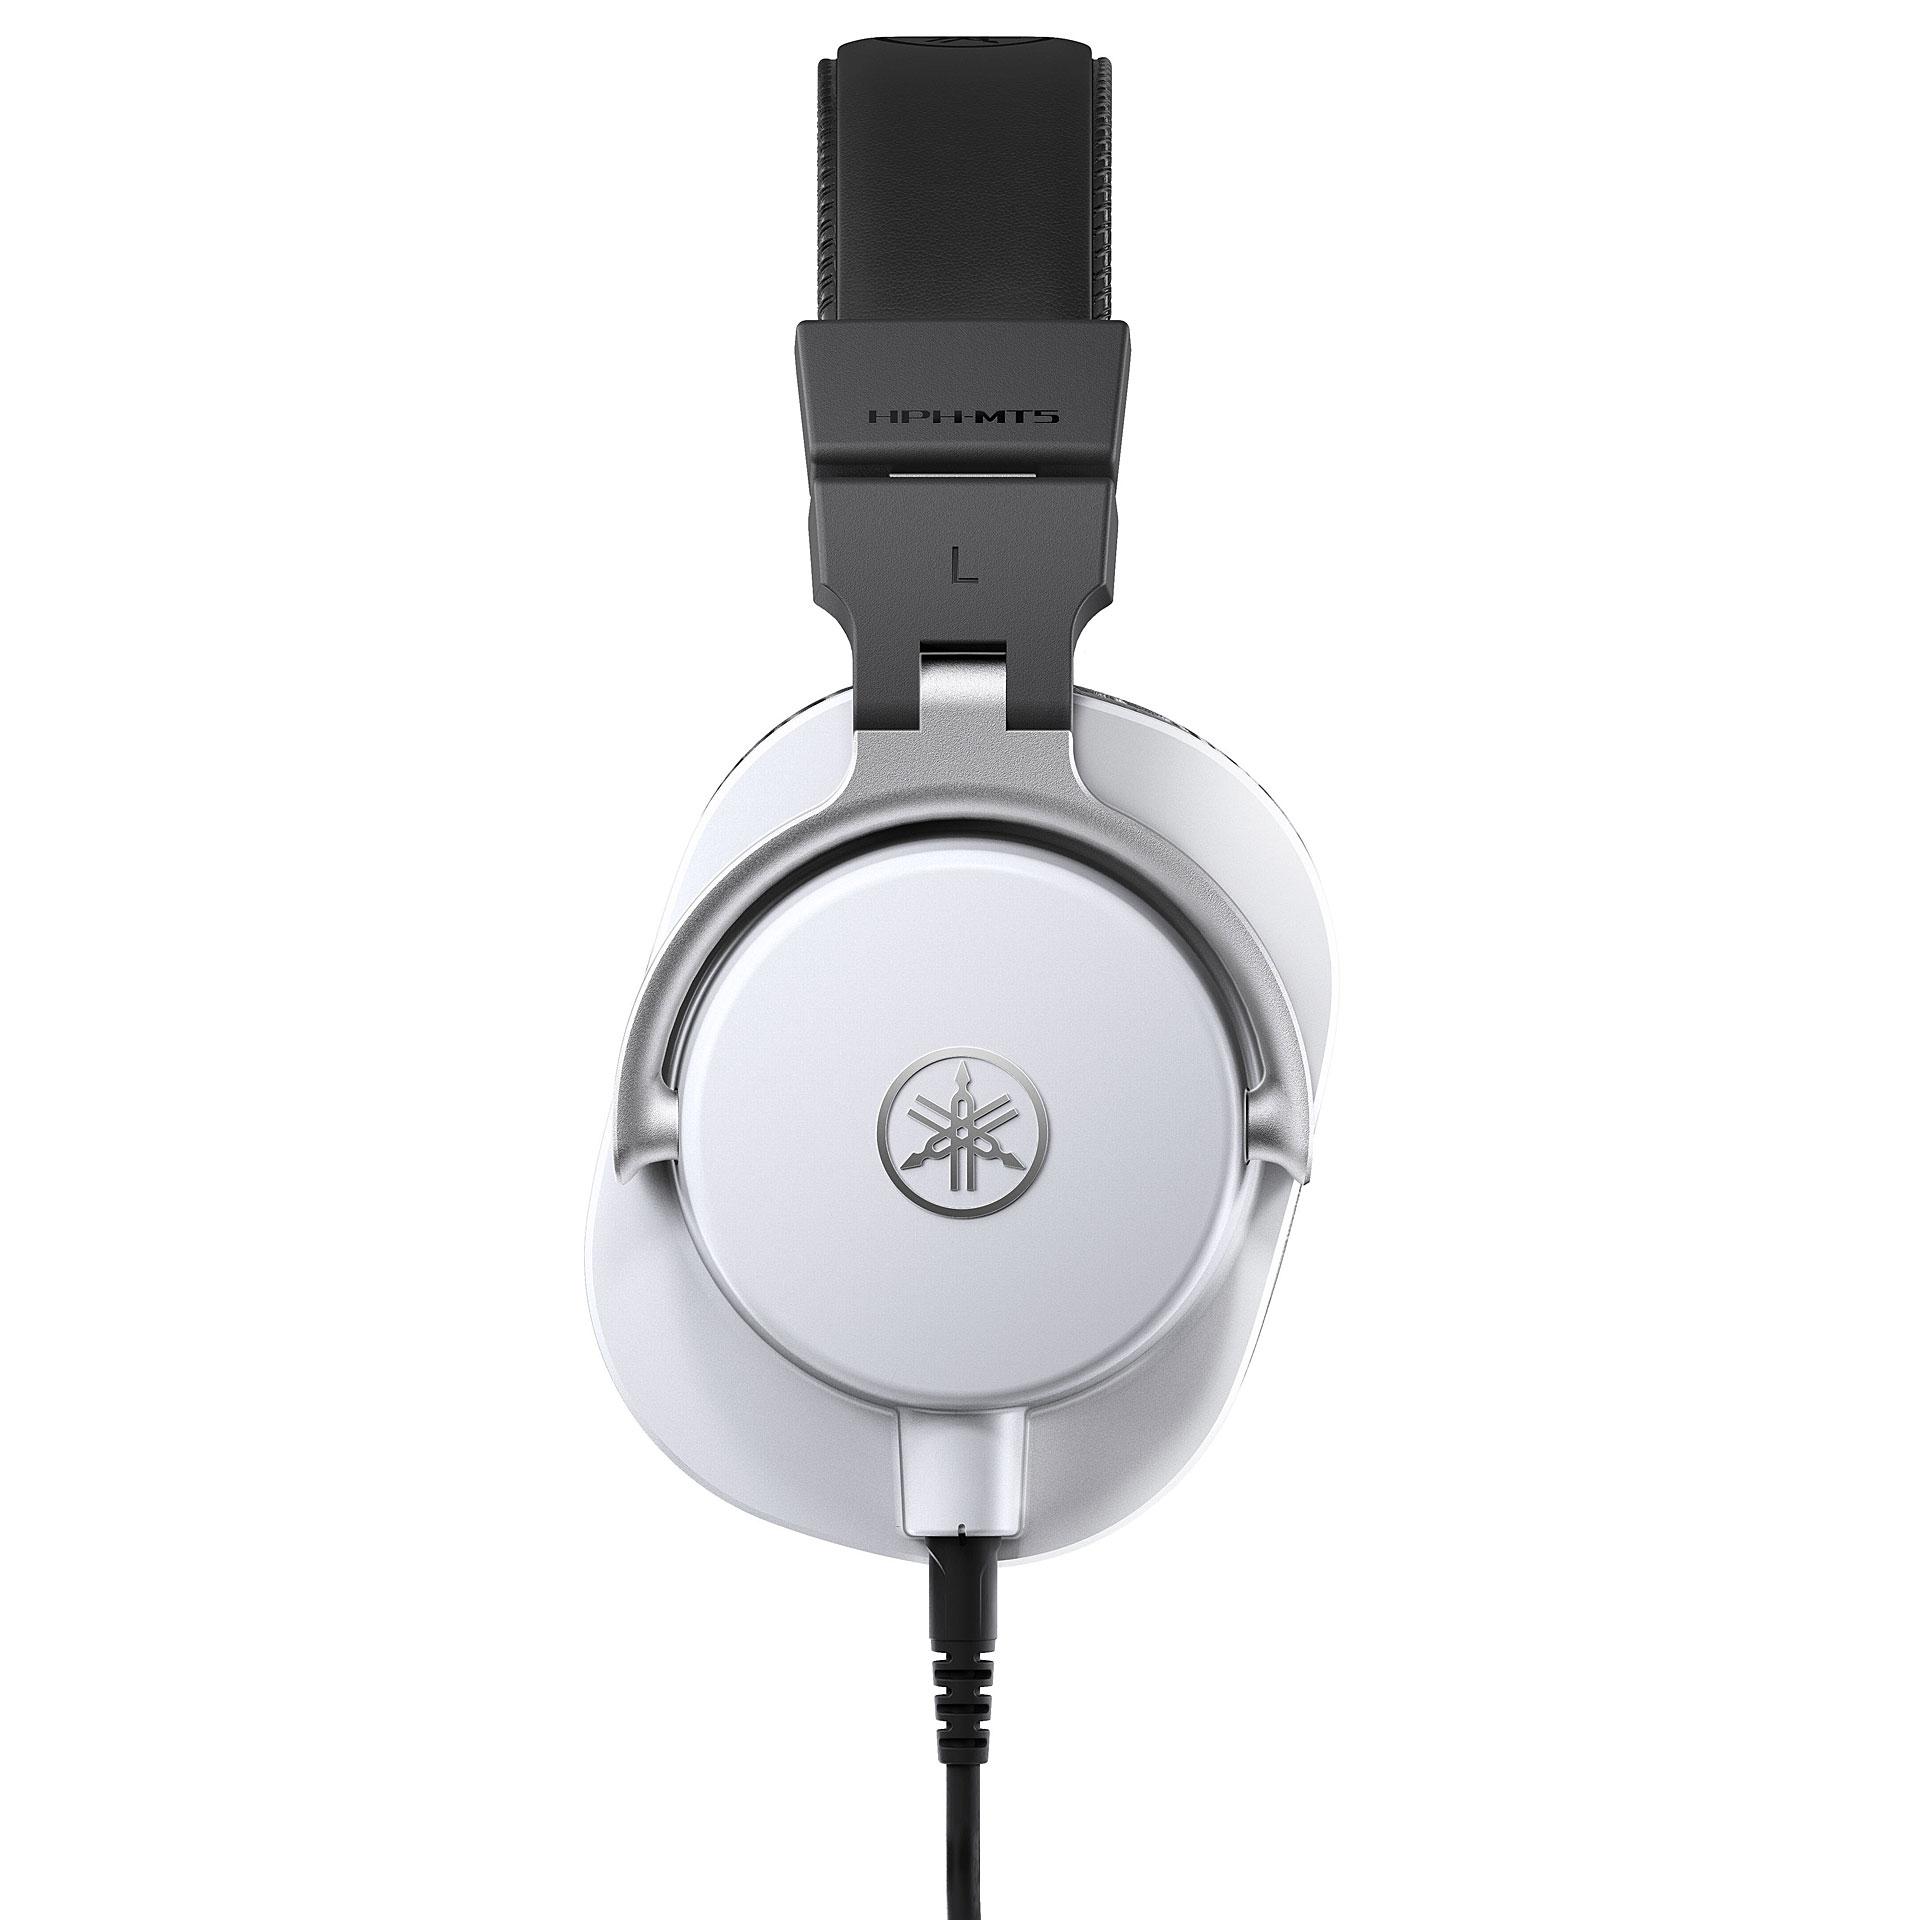 yamaha hph mt5 w headphone. Black Bedroom Furniture Sets. Home Design Ideas